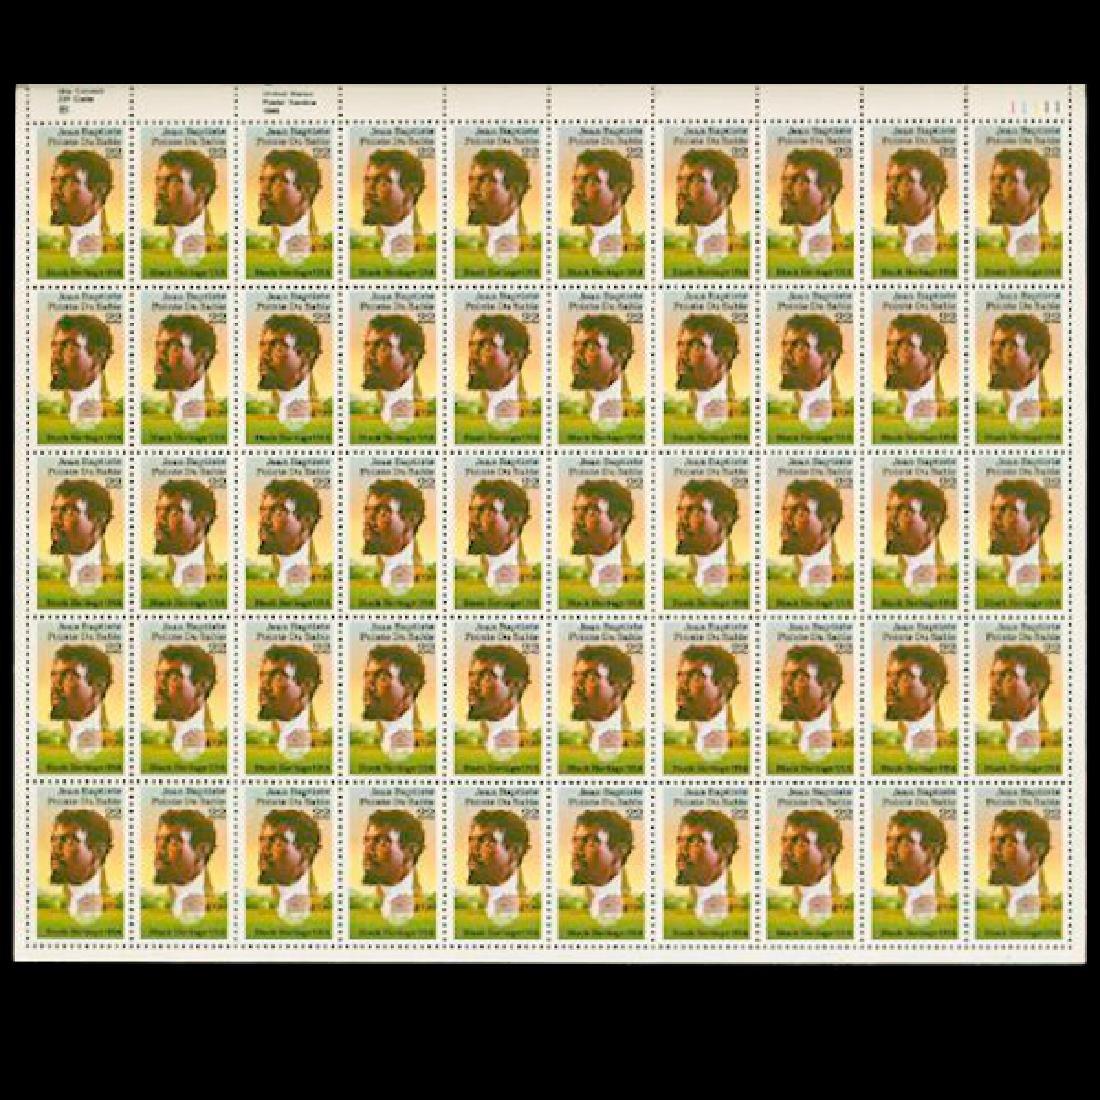 1987 US Sheet 22c Jean Baptiste Stamps MNH Scarce